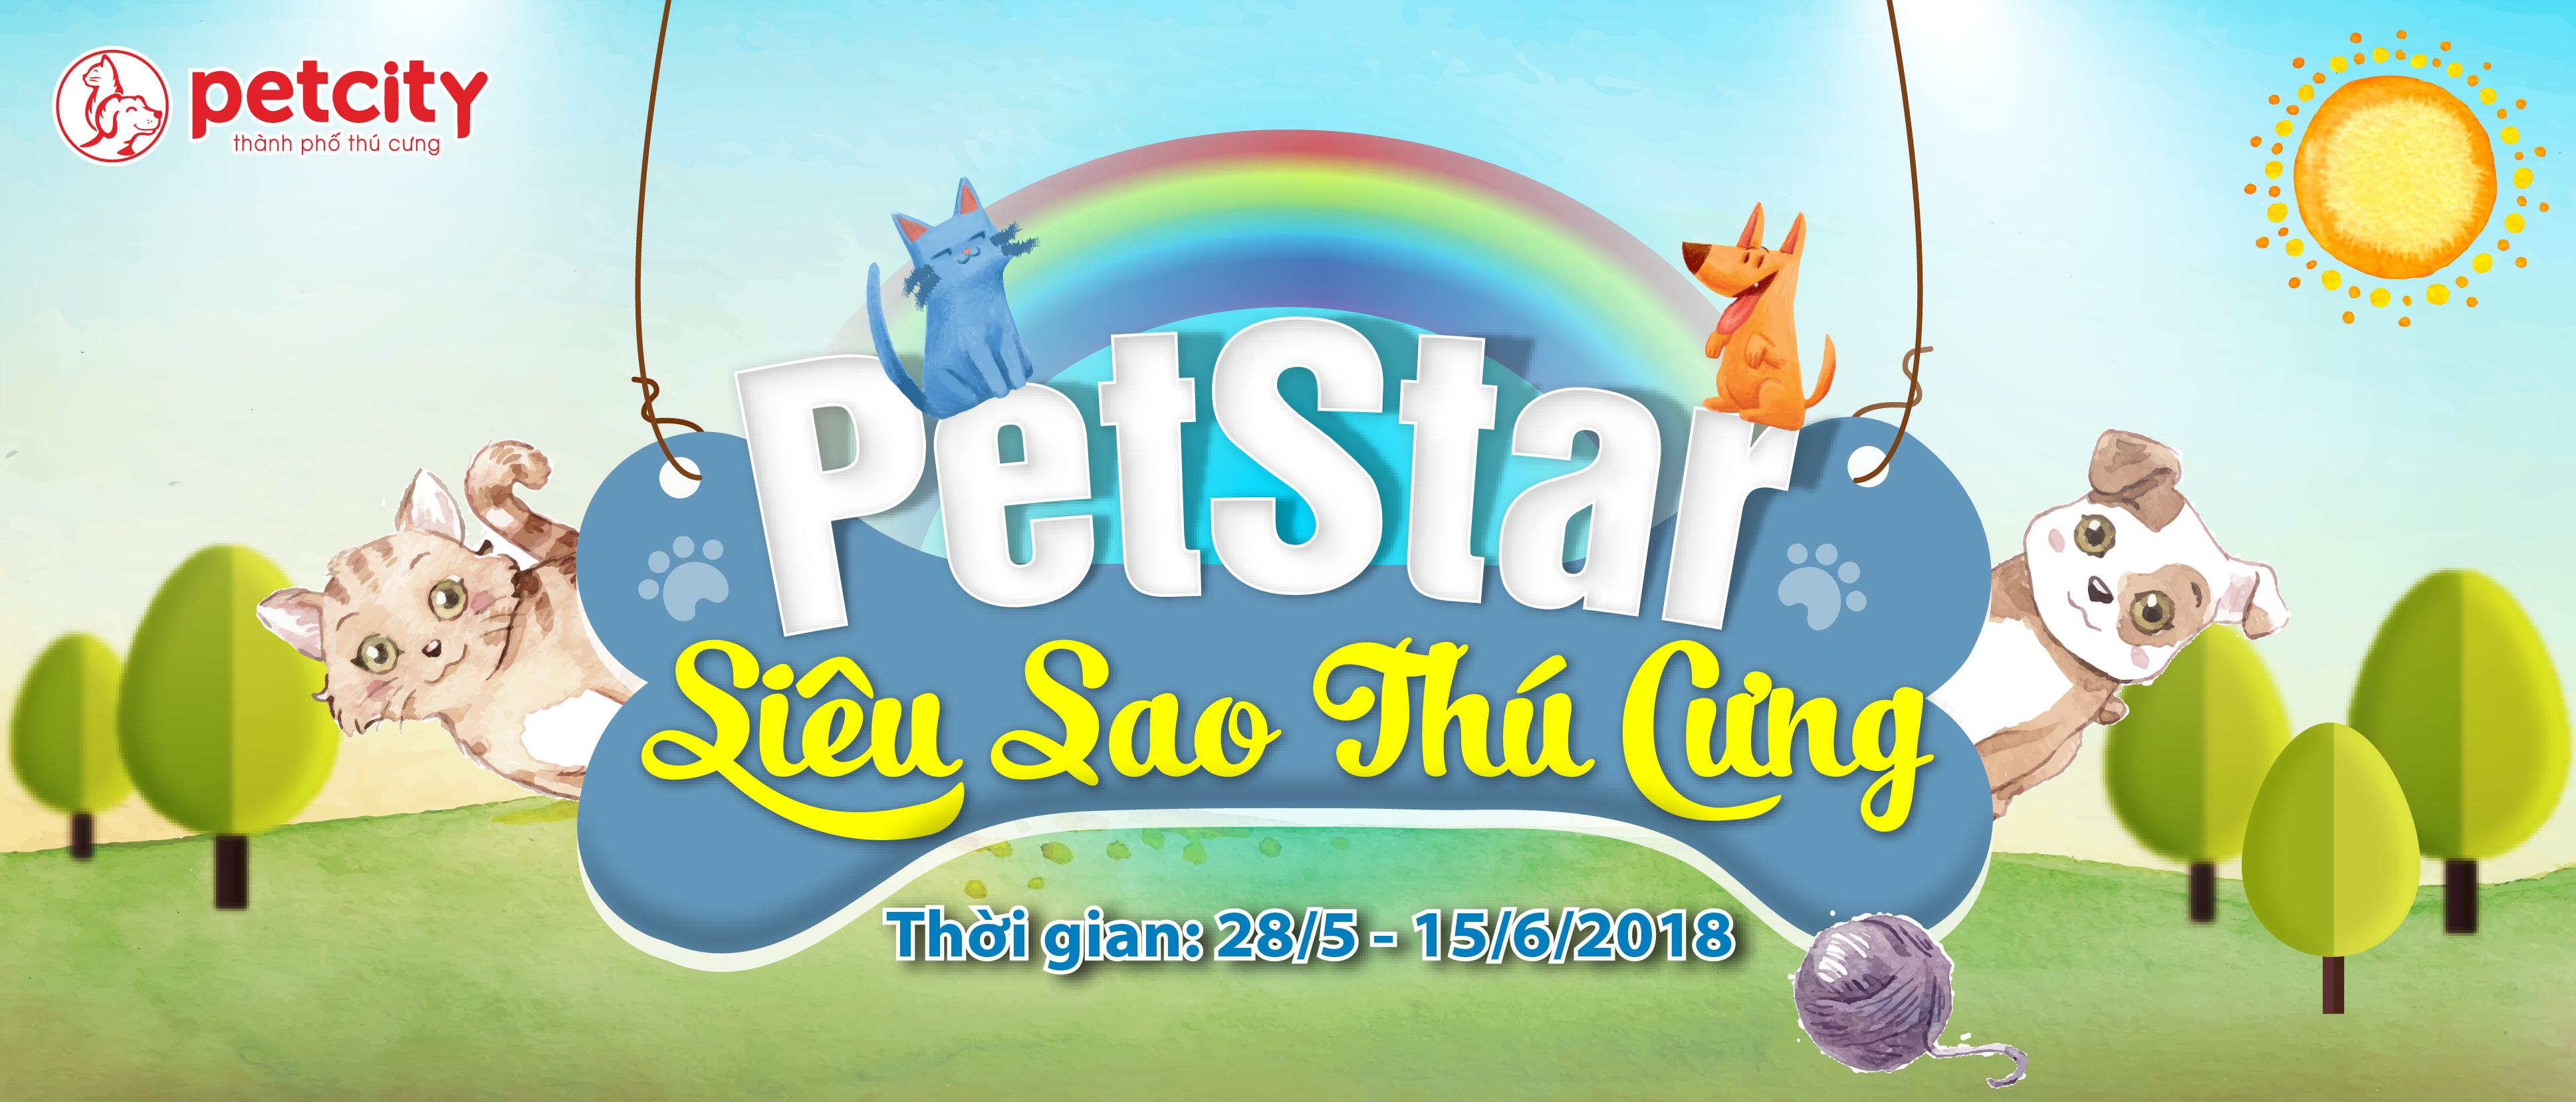 "Cuộc Thi Ảnh Online ""Pet Star Super Model – Siêu Sao Siêu Mẫu"""